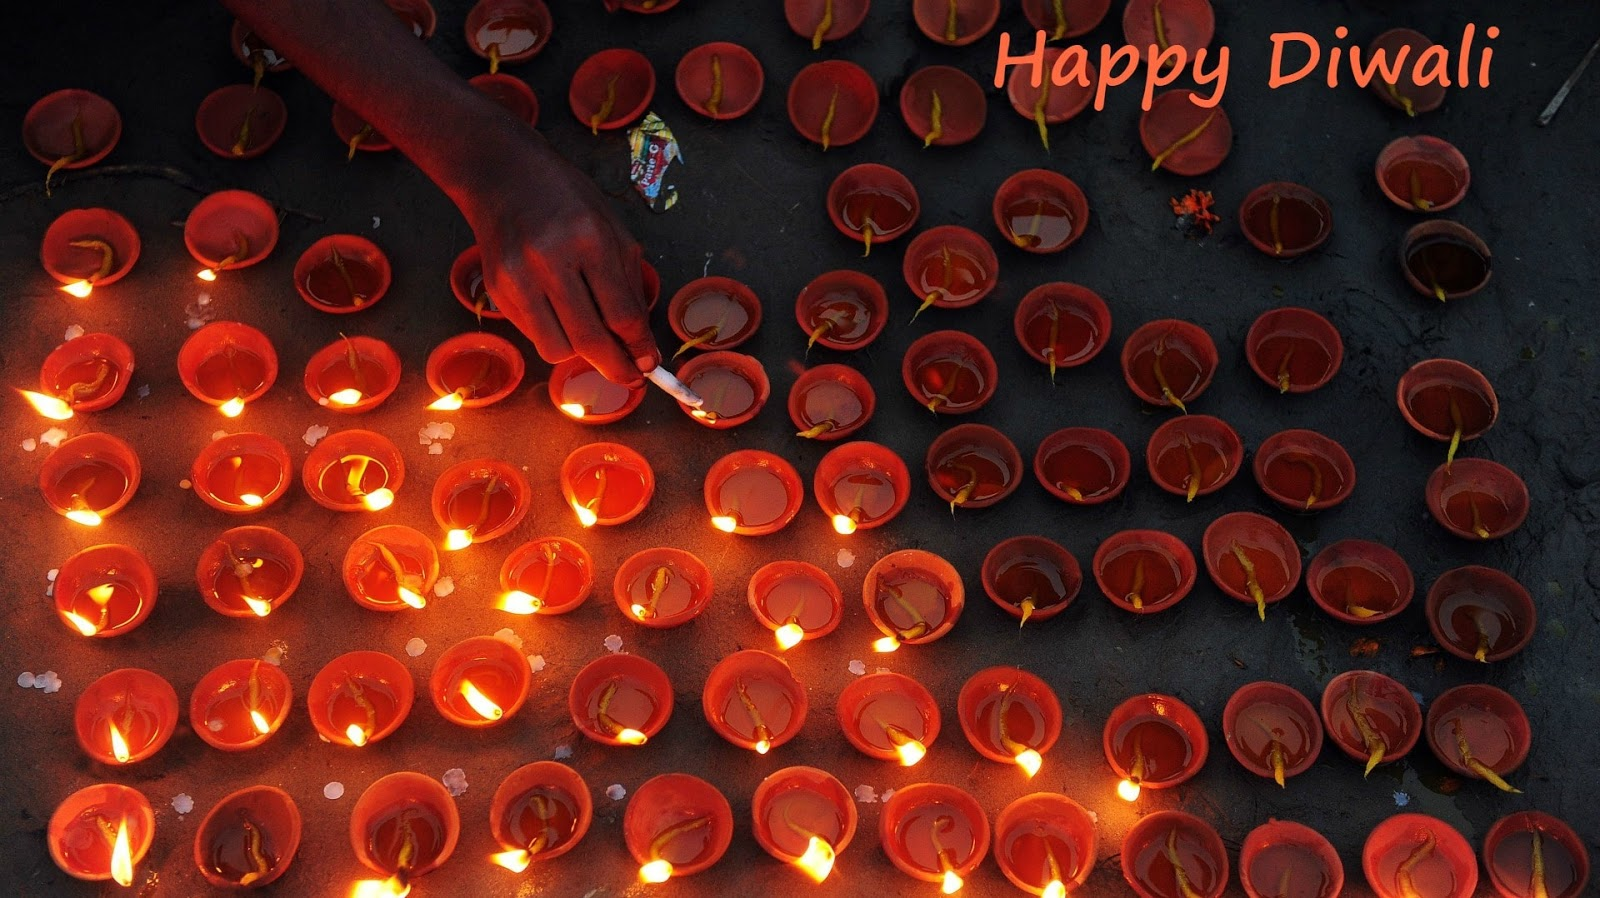 happy diwali 2016 greeting